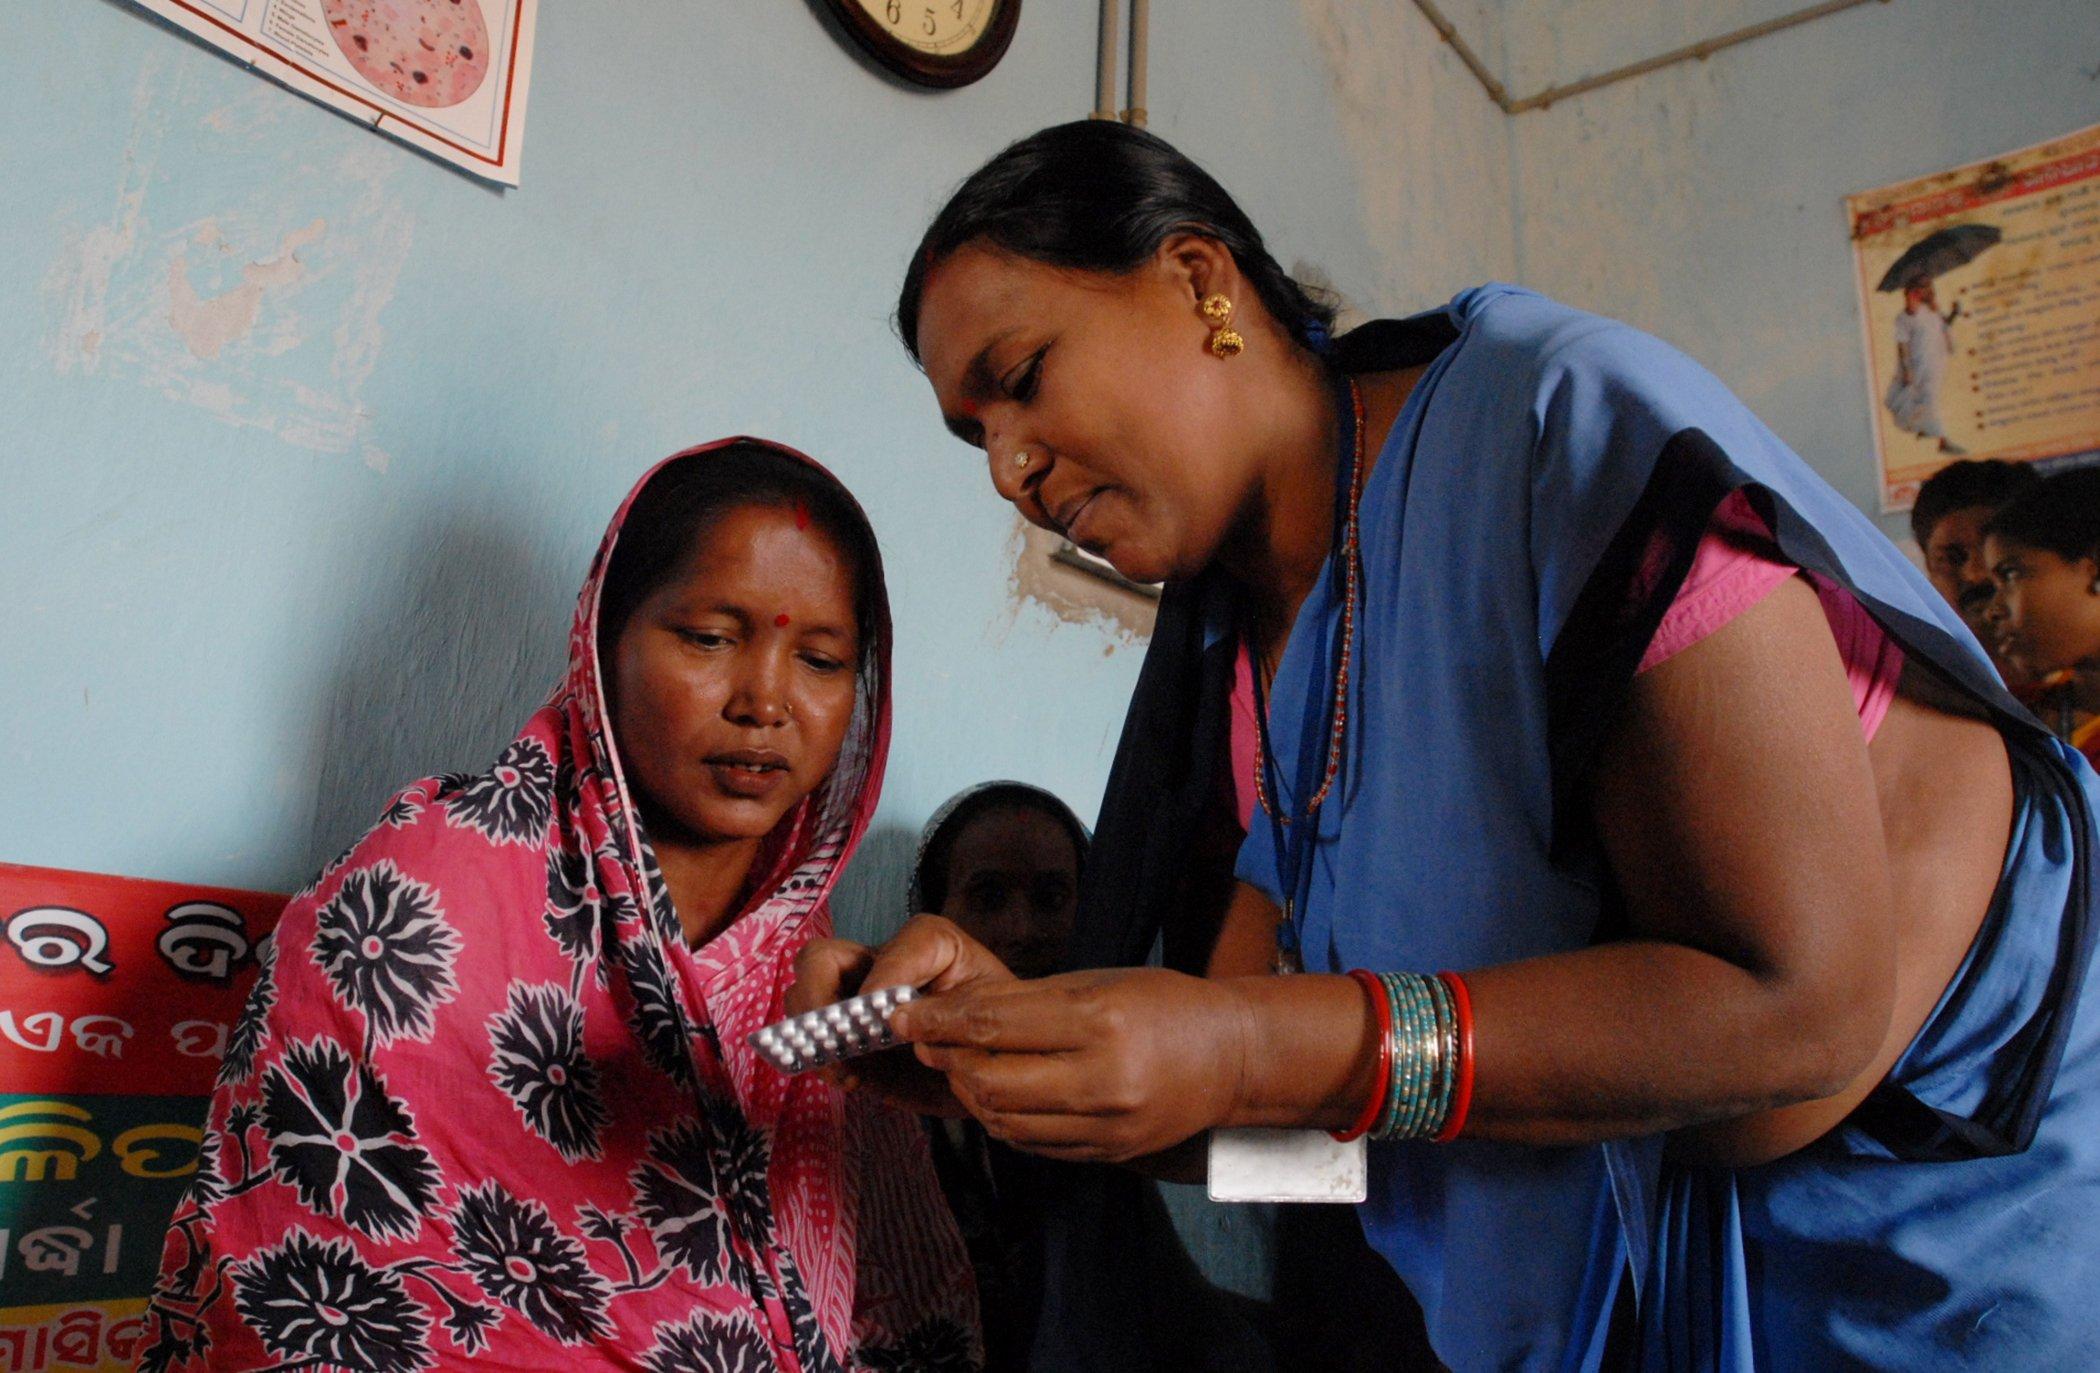 familienplanung-unfpa-frauenrechte-gleichberechtigung-geschlechtergleichstellung-global-citizen.jpg